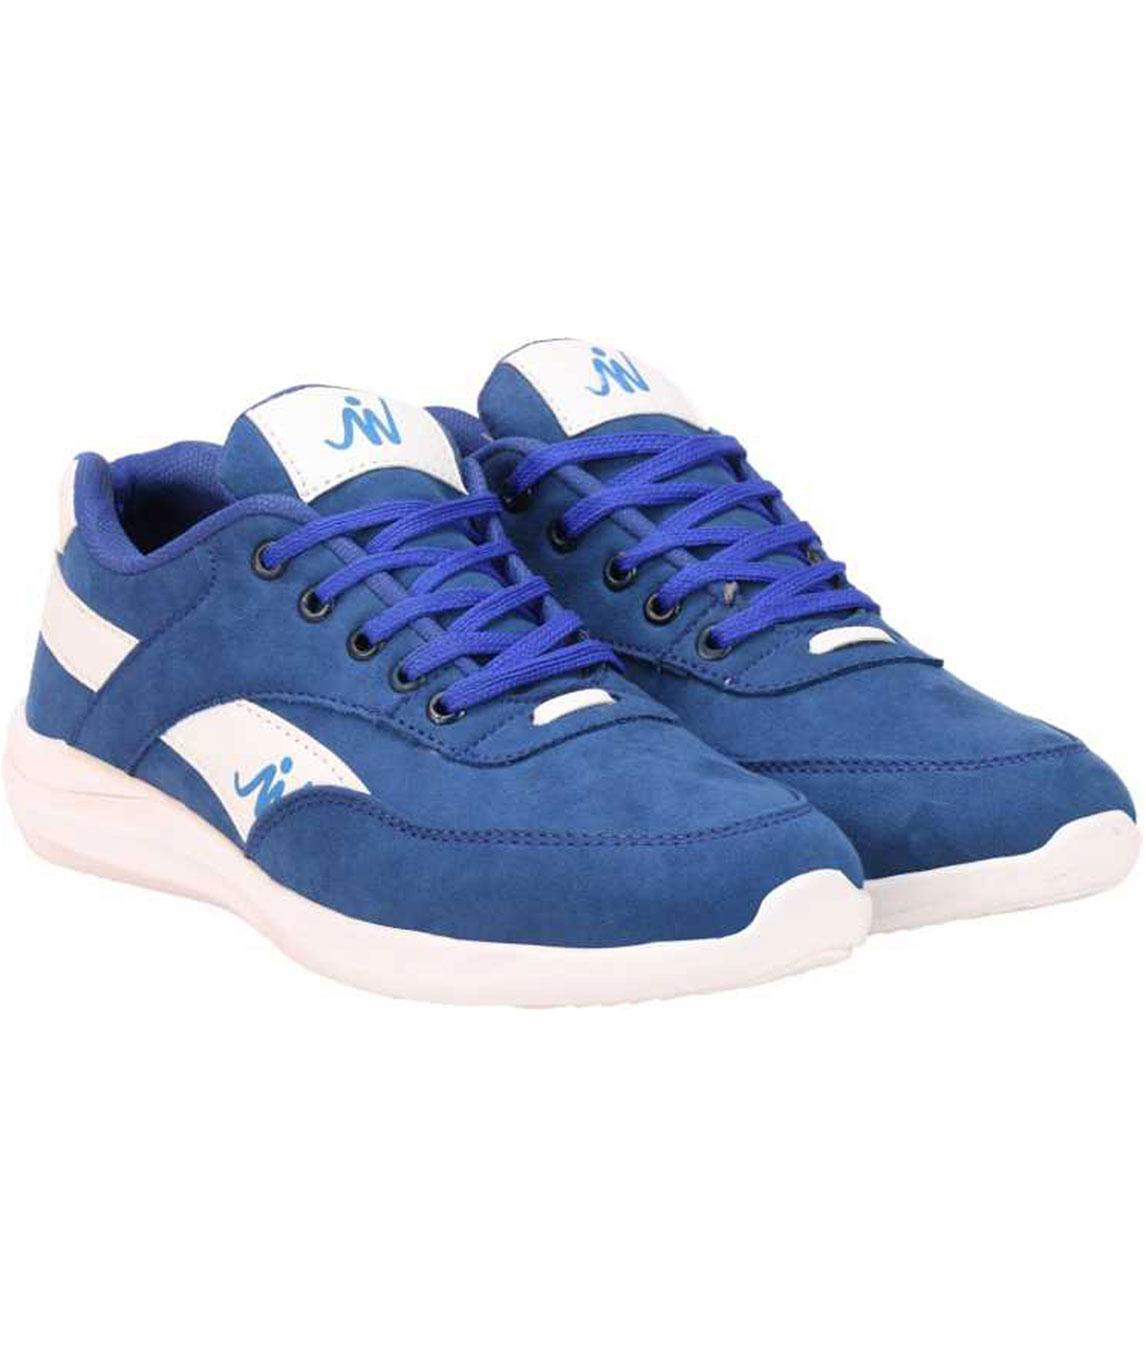 M-RBUK WALKING SHOES FOR MEN (BLUE)